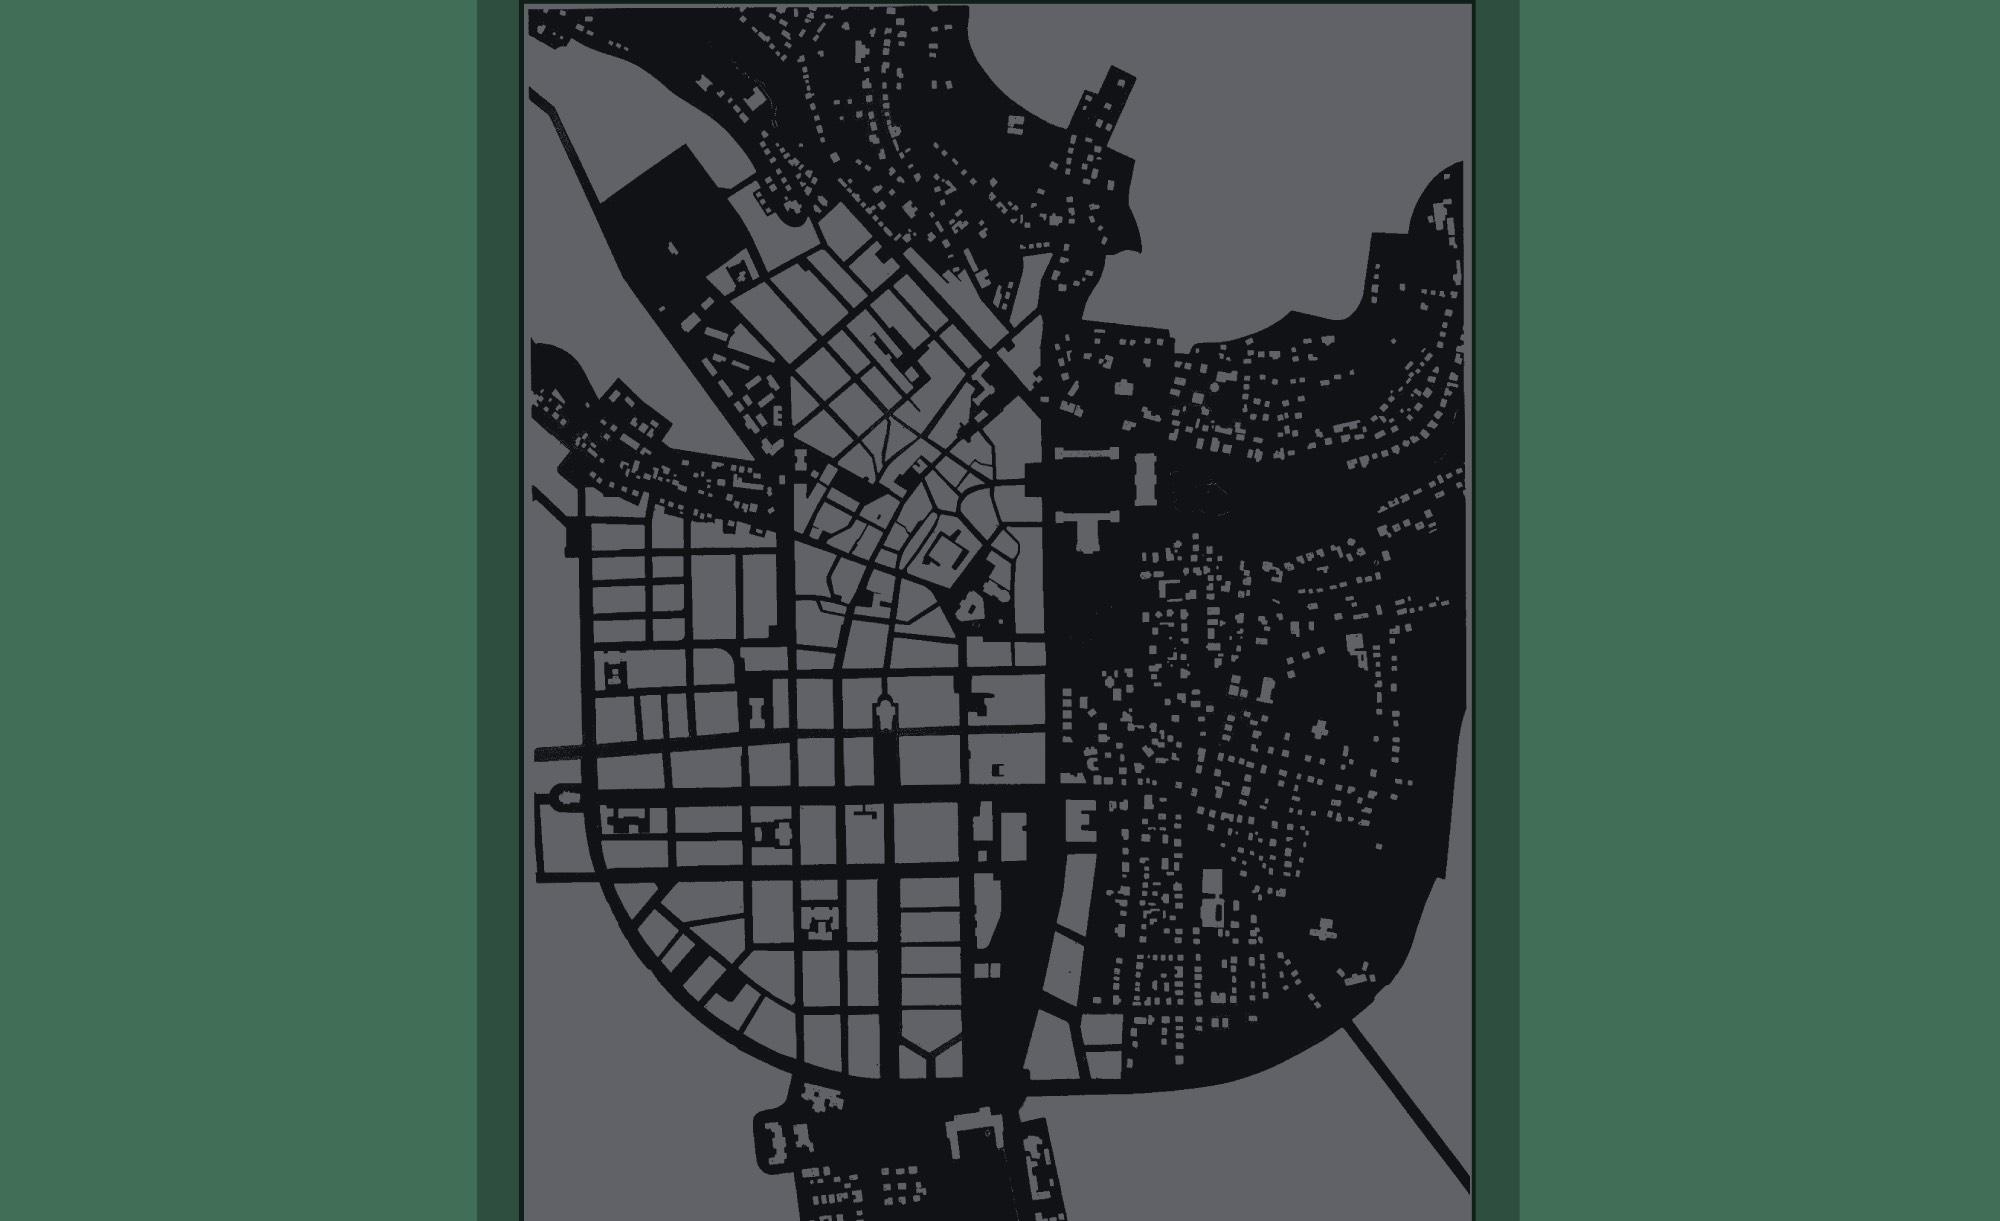 Collage City - Η πόλη ως κολάζ